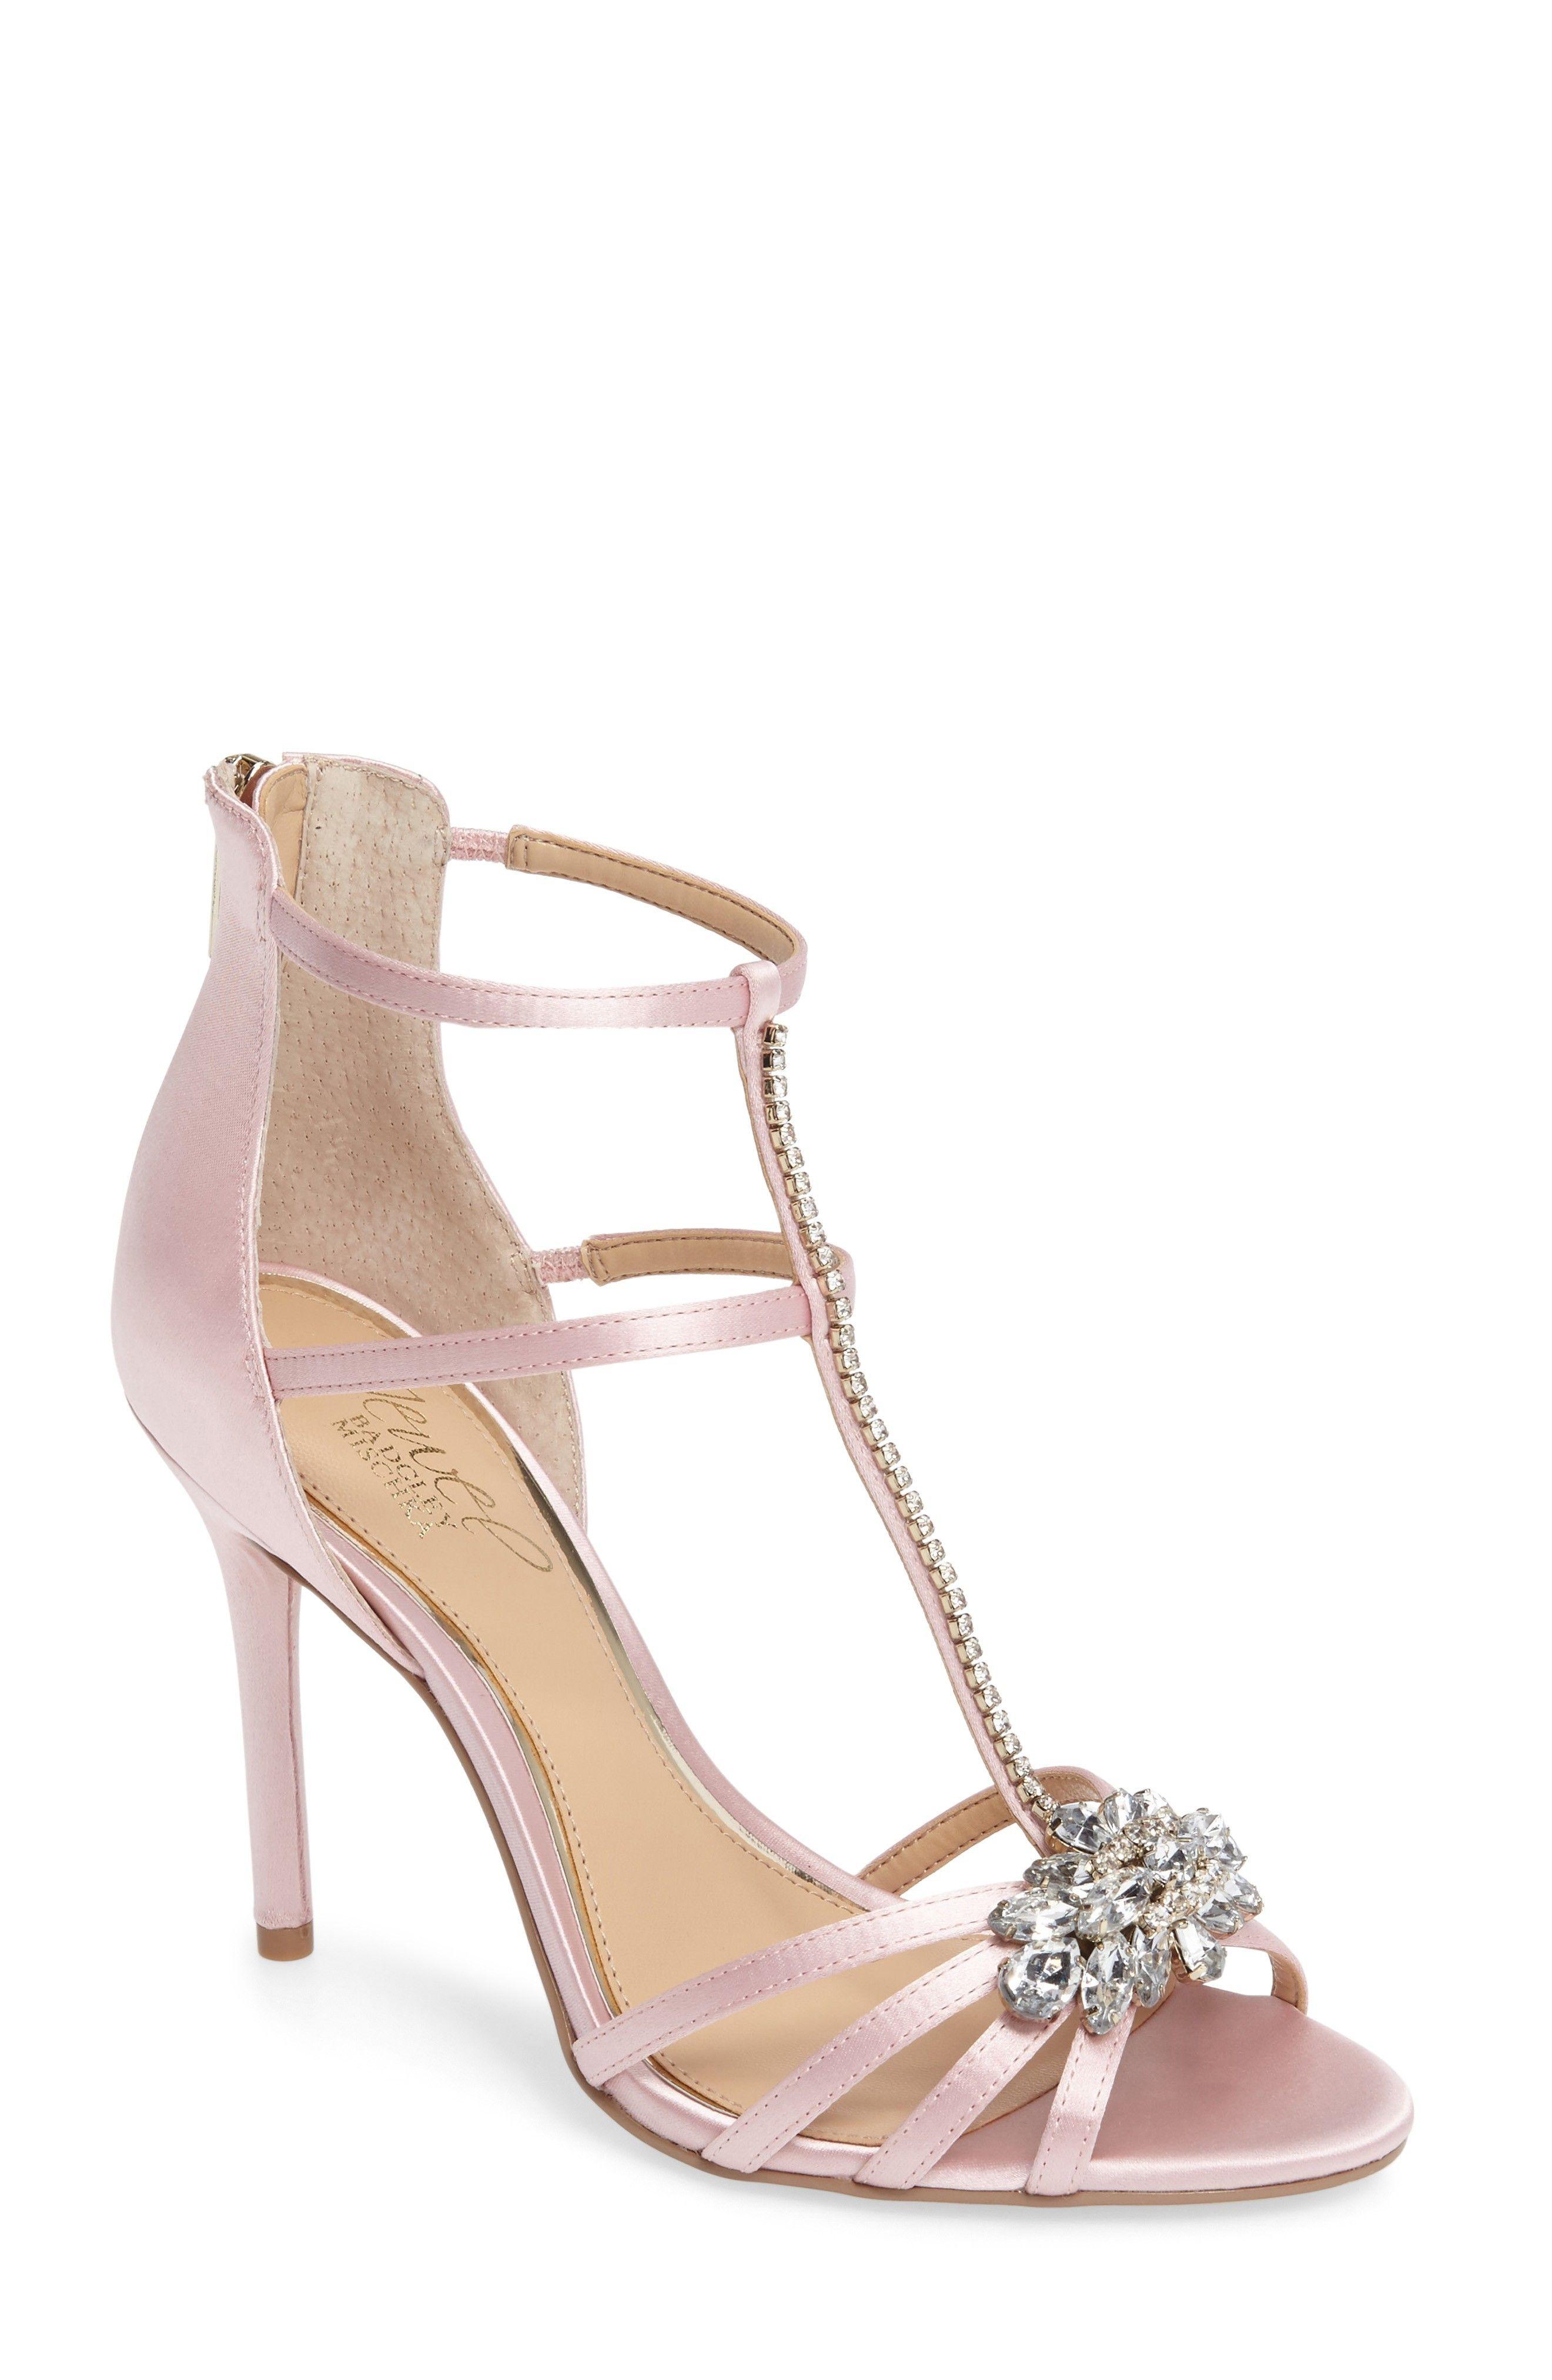 Blush Wedding Styling Nordstrom Anniversary Sale